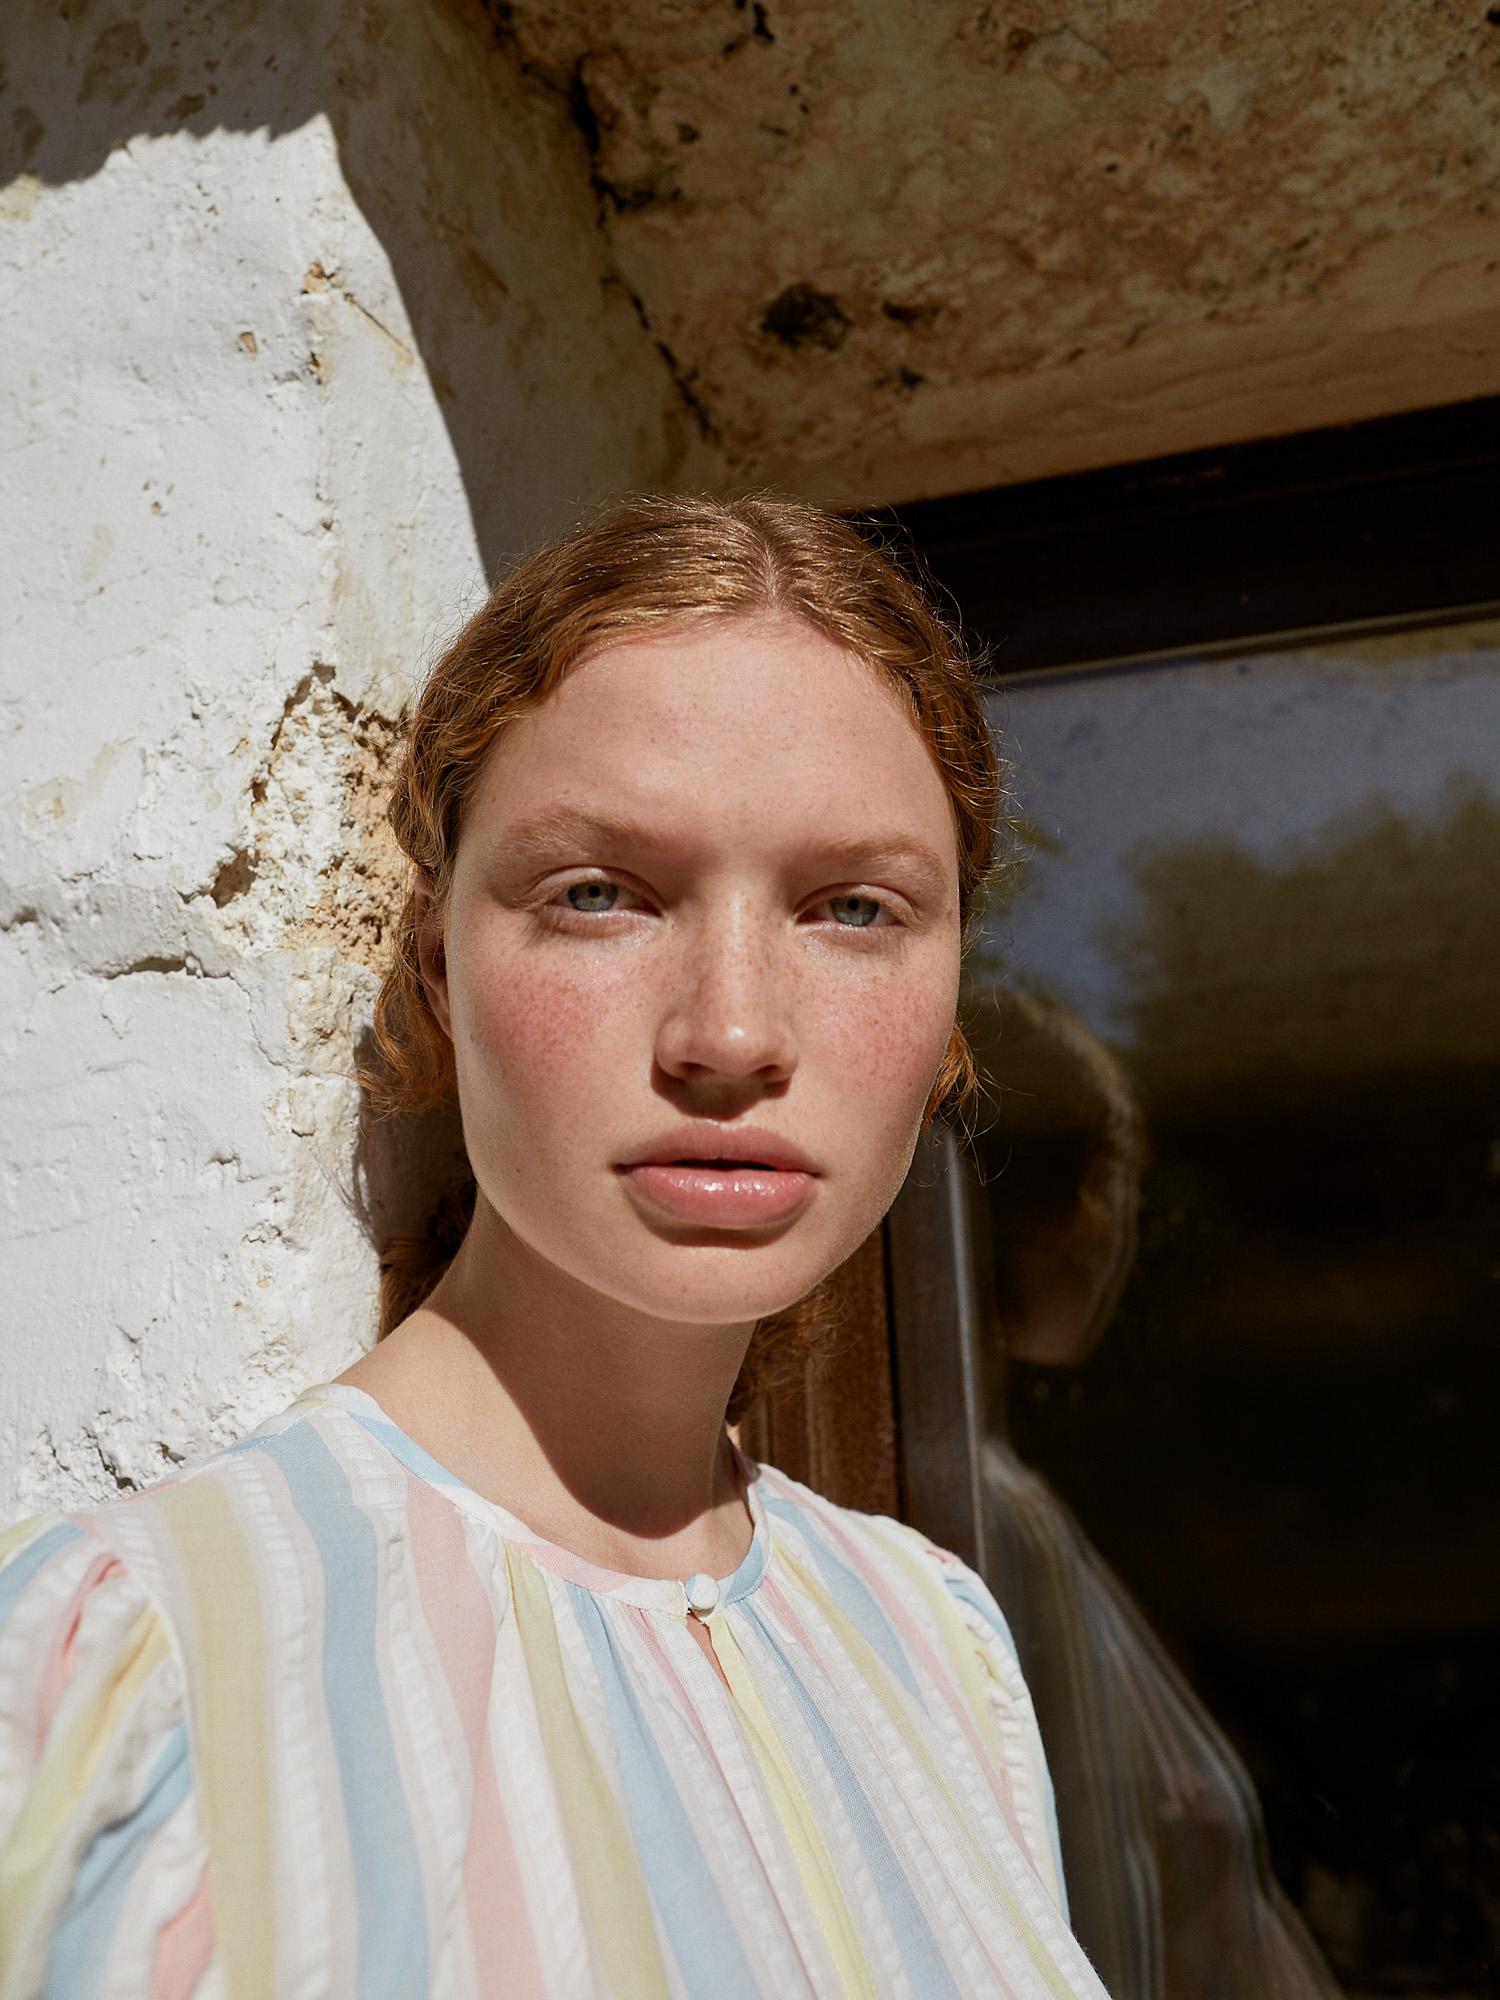 TeresaHorstmann_EditedImperfections_10